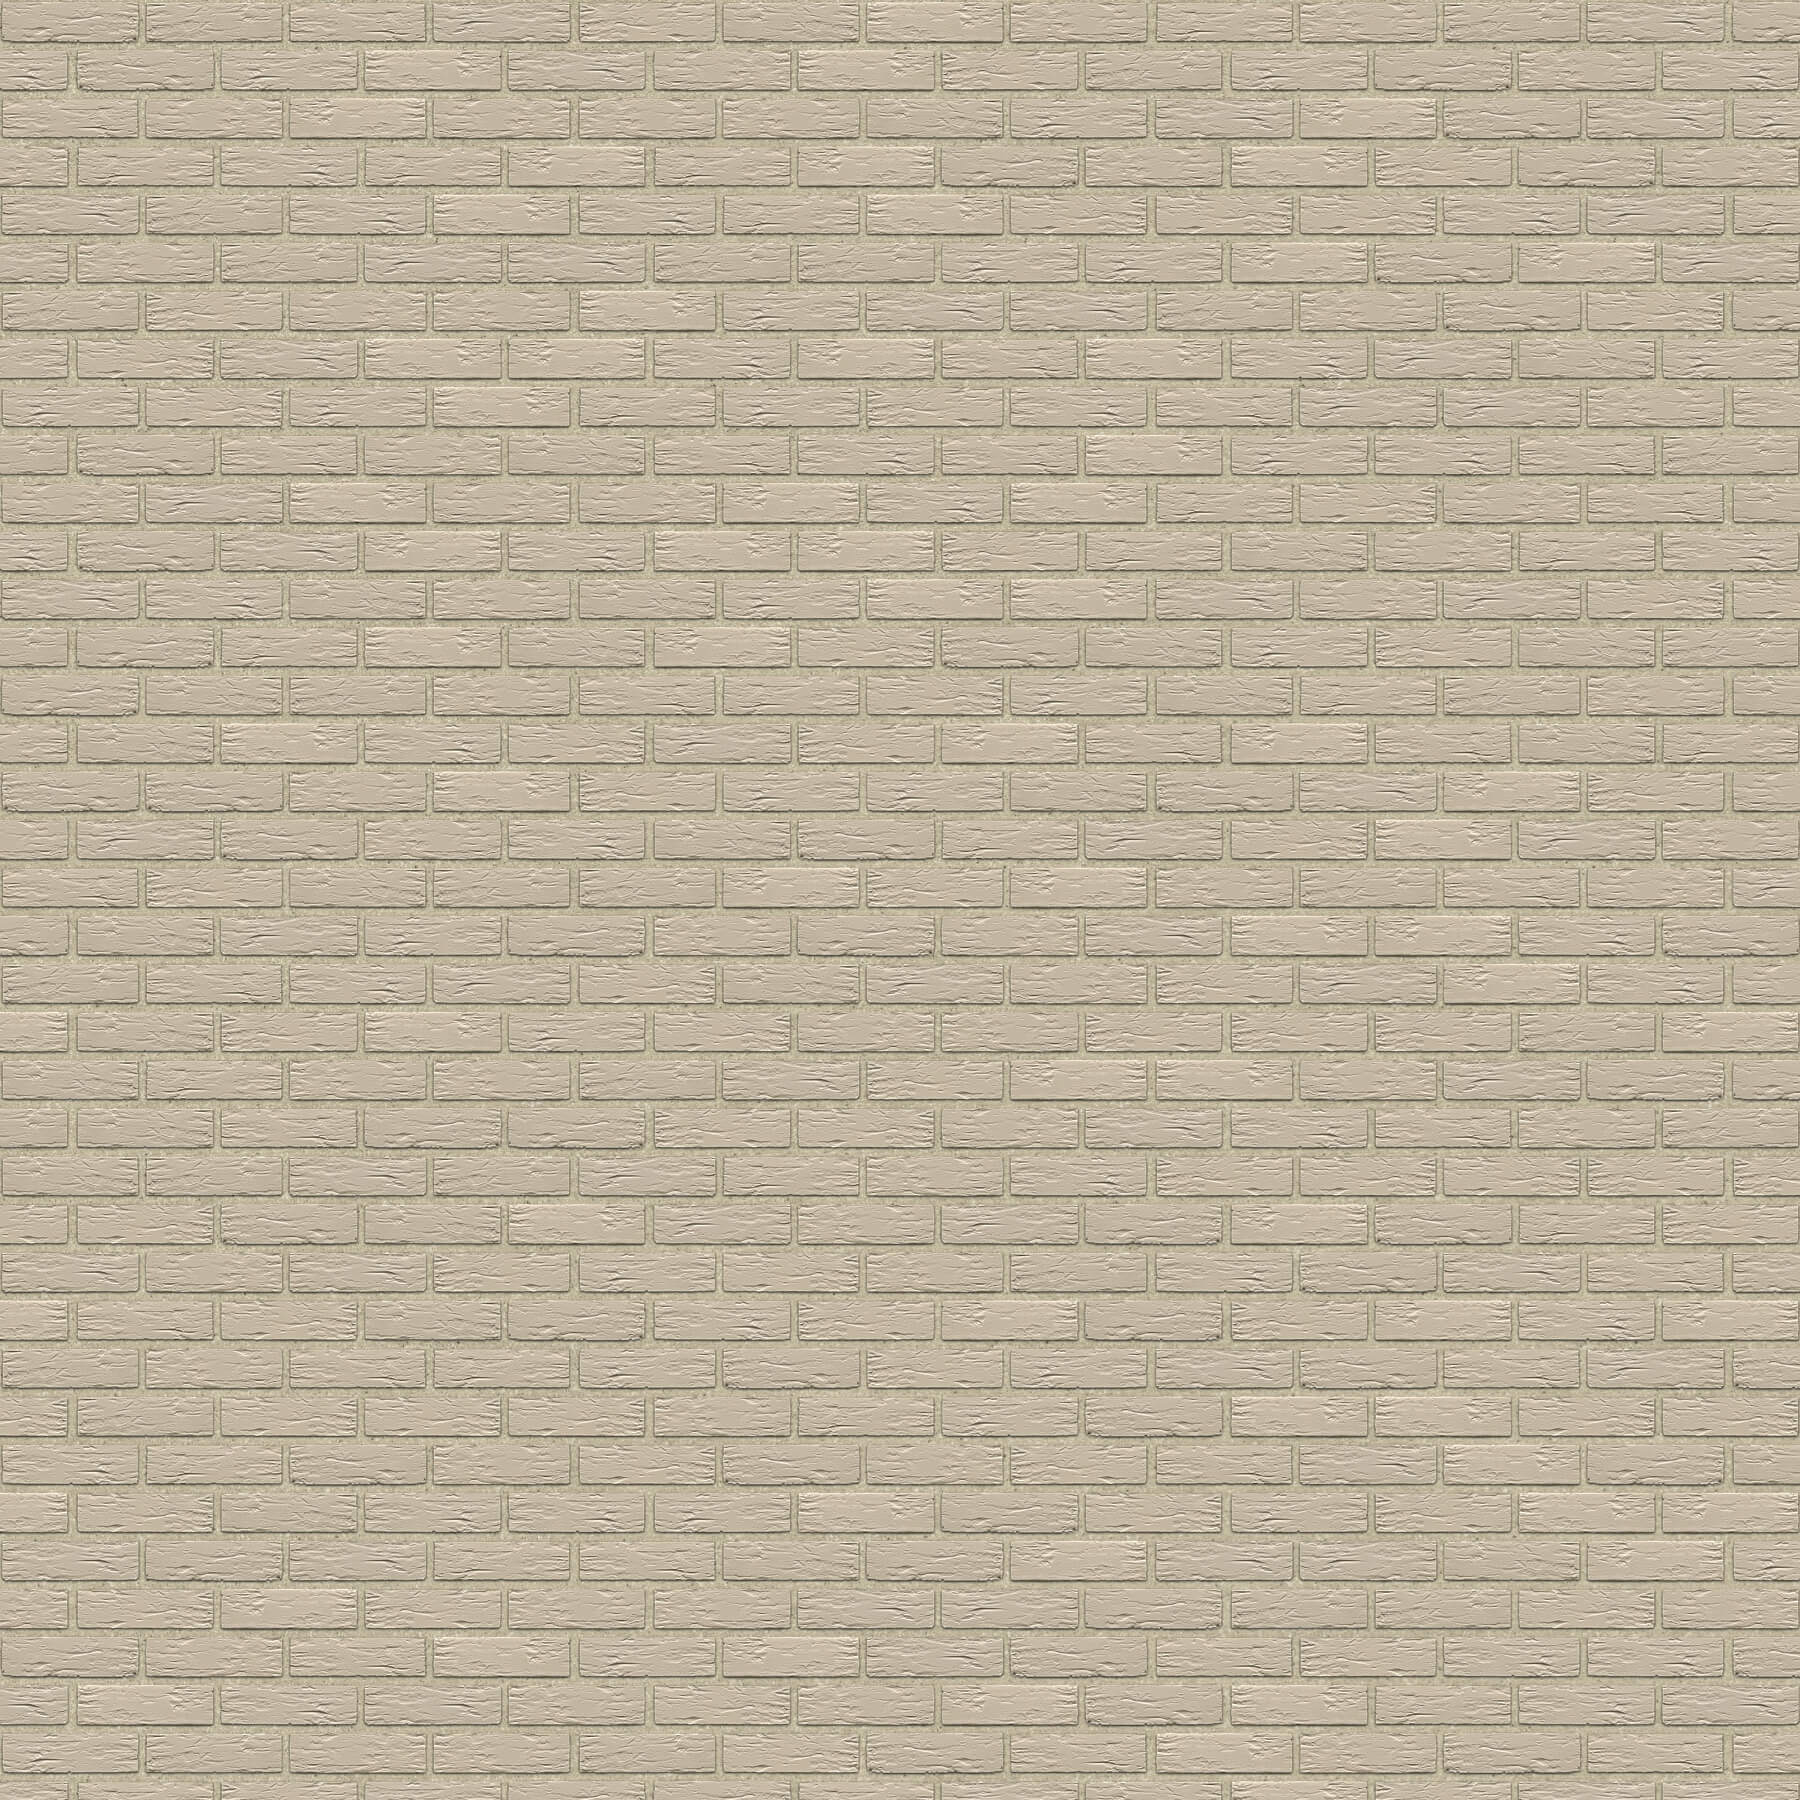 Dekorativna cigla listela FeldHaus Klinker r-840 nf Bez Fuga